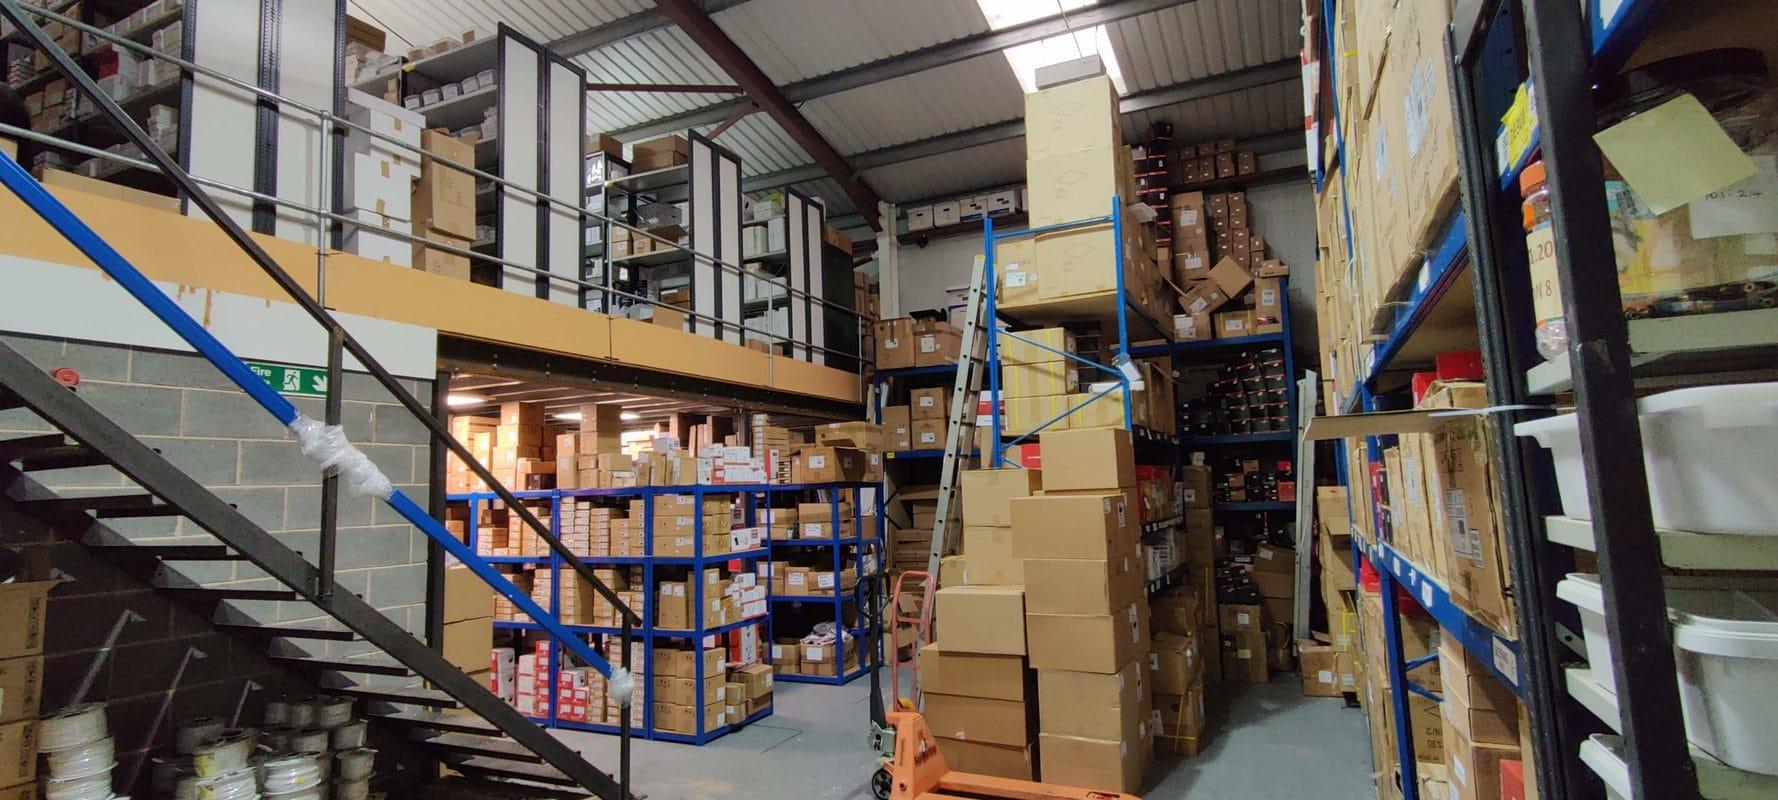 Traders Warehouse's warehouse